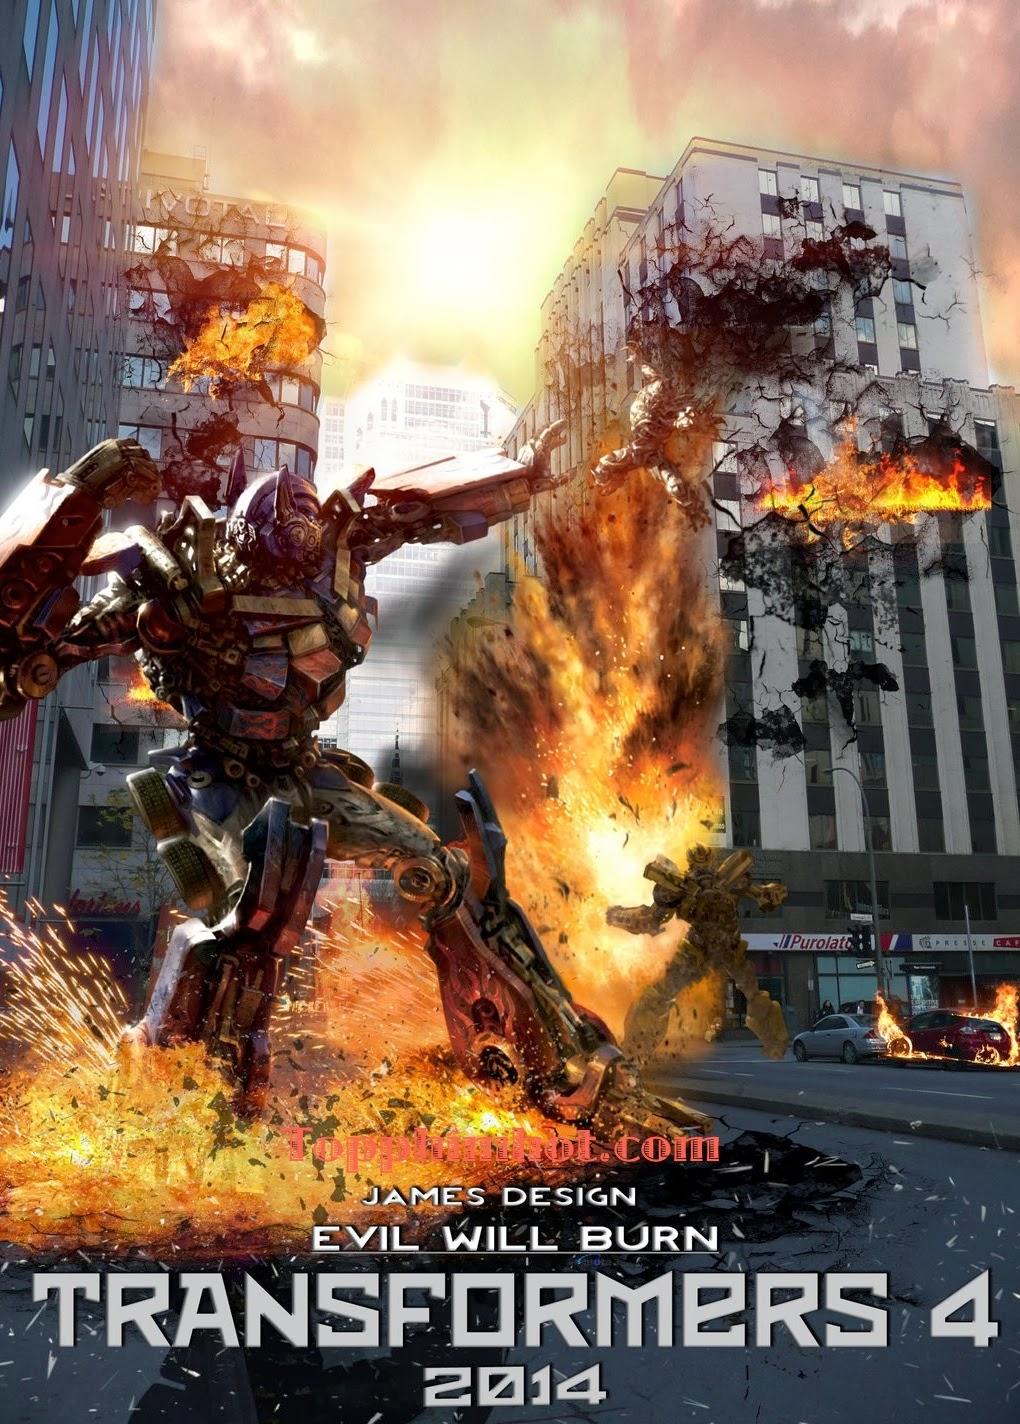 Transformers 4:kỷ Nguyên Hủy Diệt - Transformers 4 : Age Of Extinction